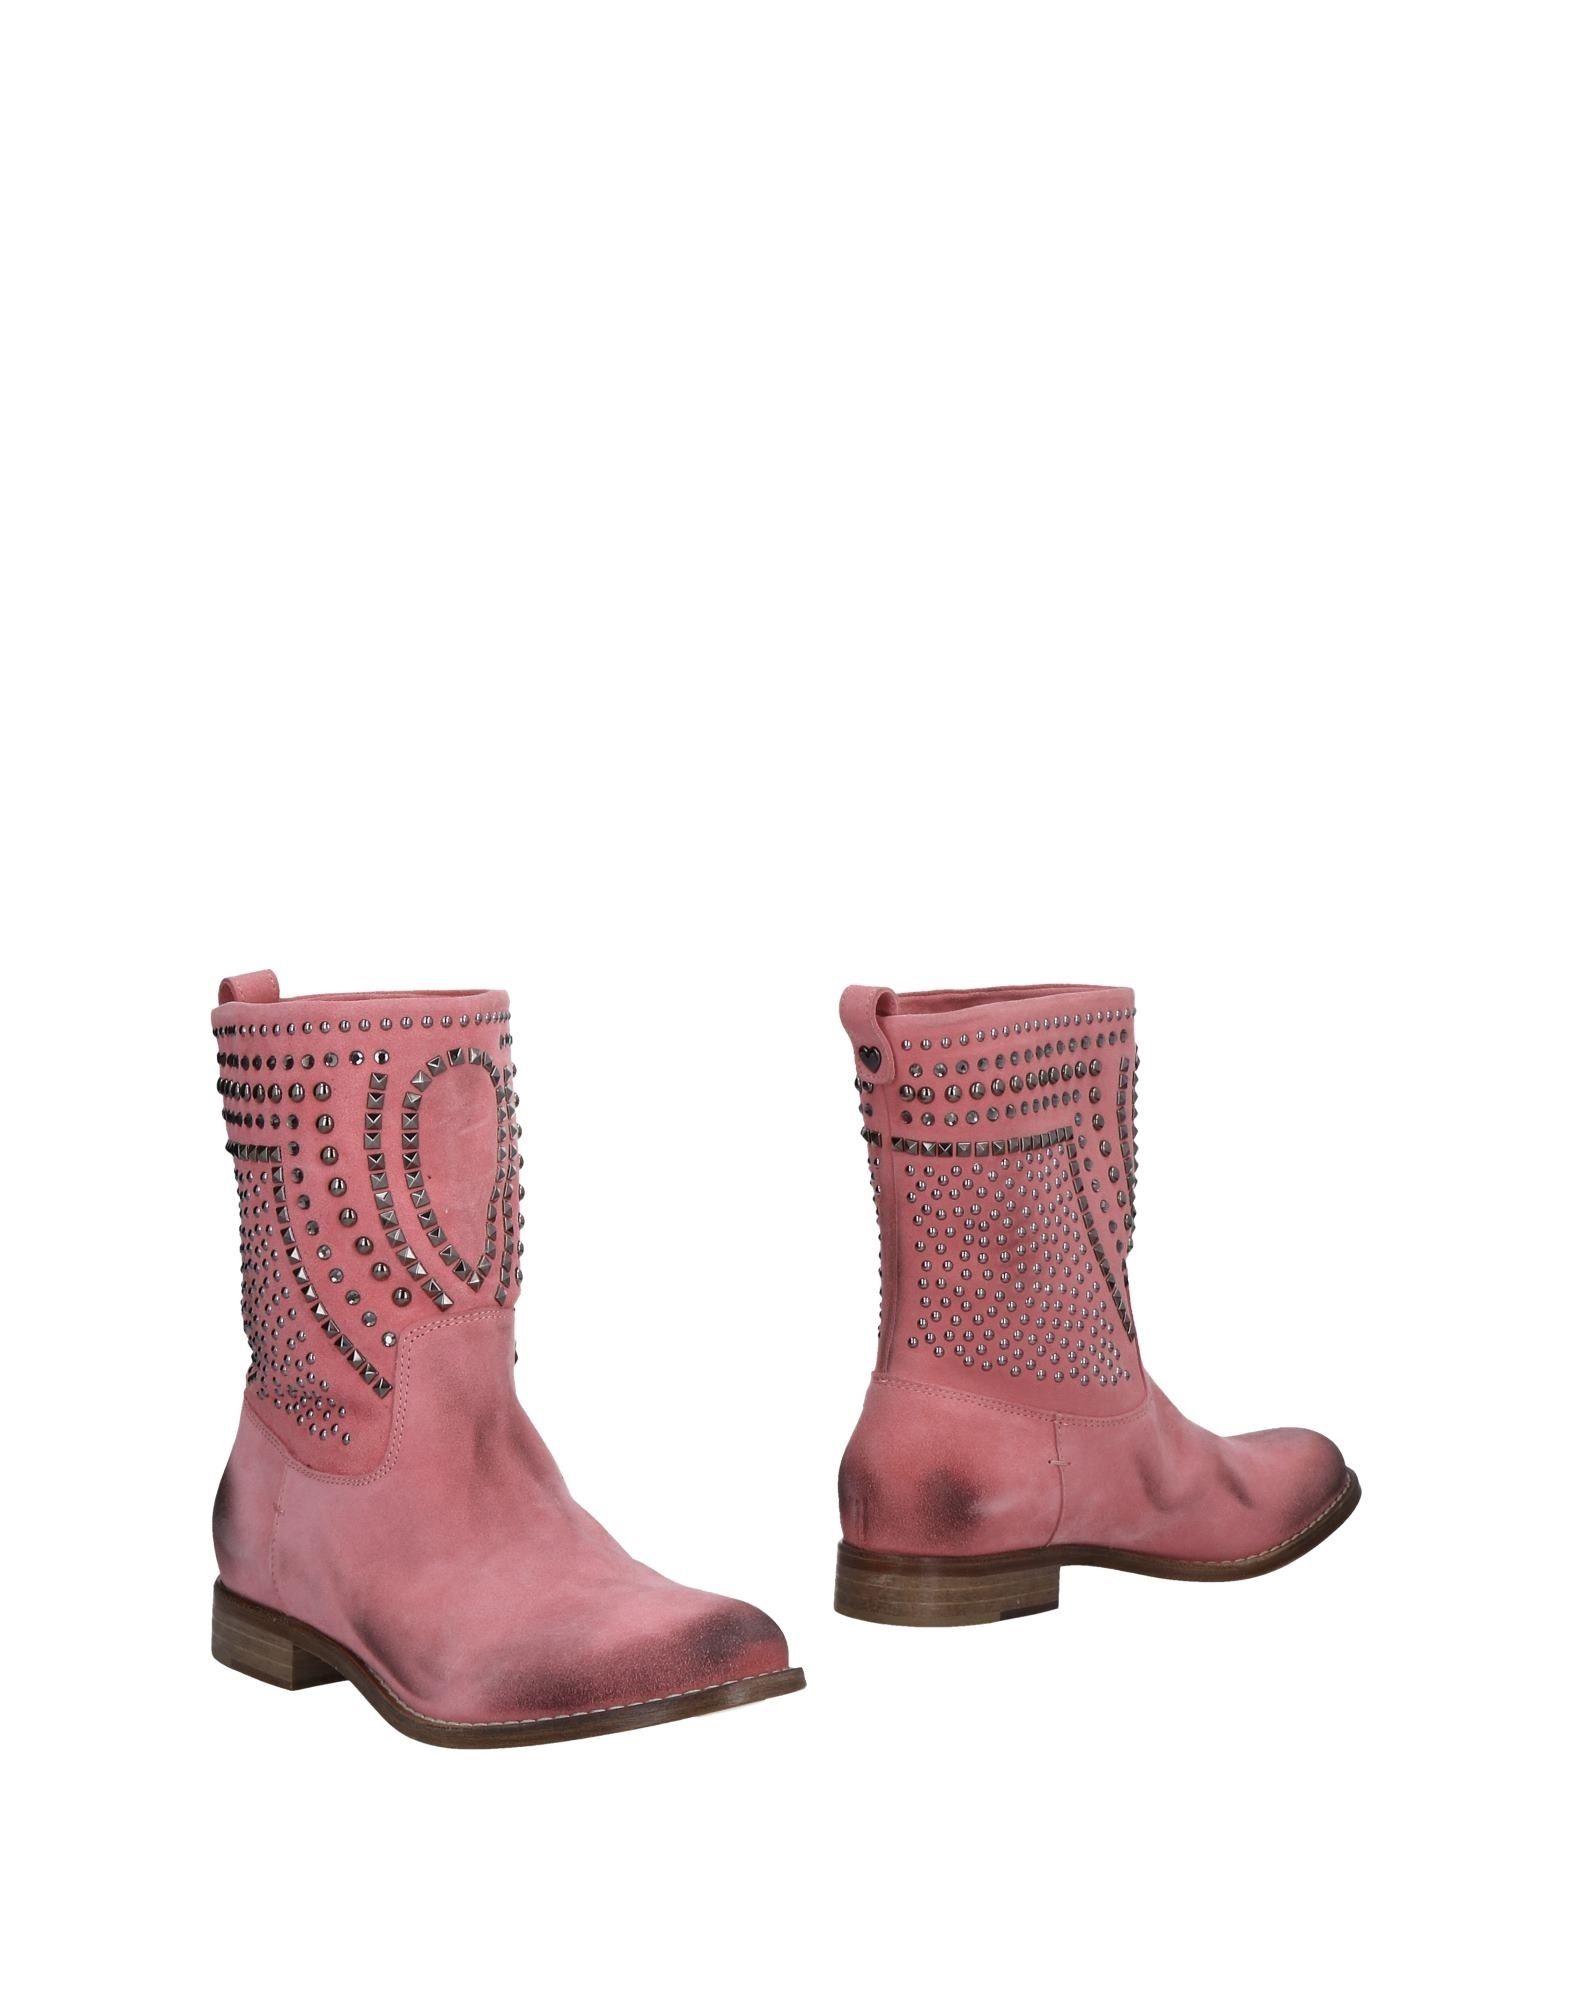 Haltbare Mode billige Schuhe Beliebte Twin 11495984QT Beliebte Schuhe Schuhe f91786